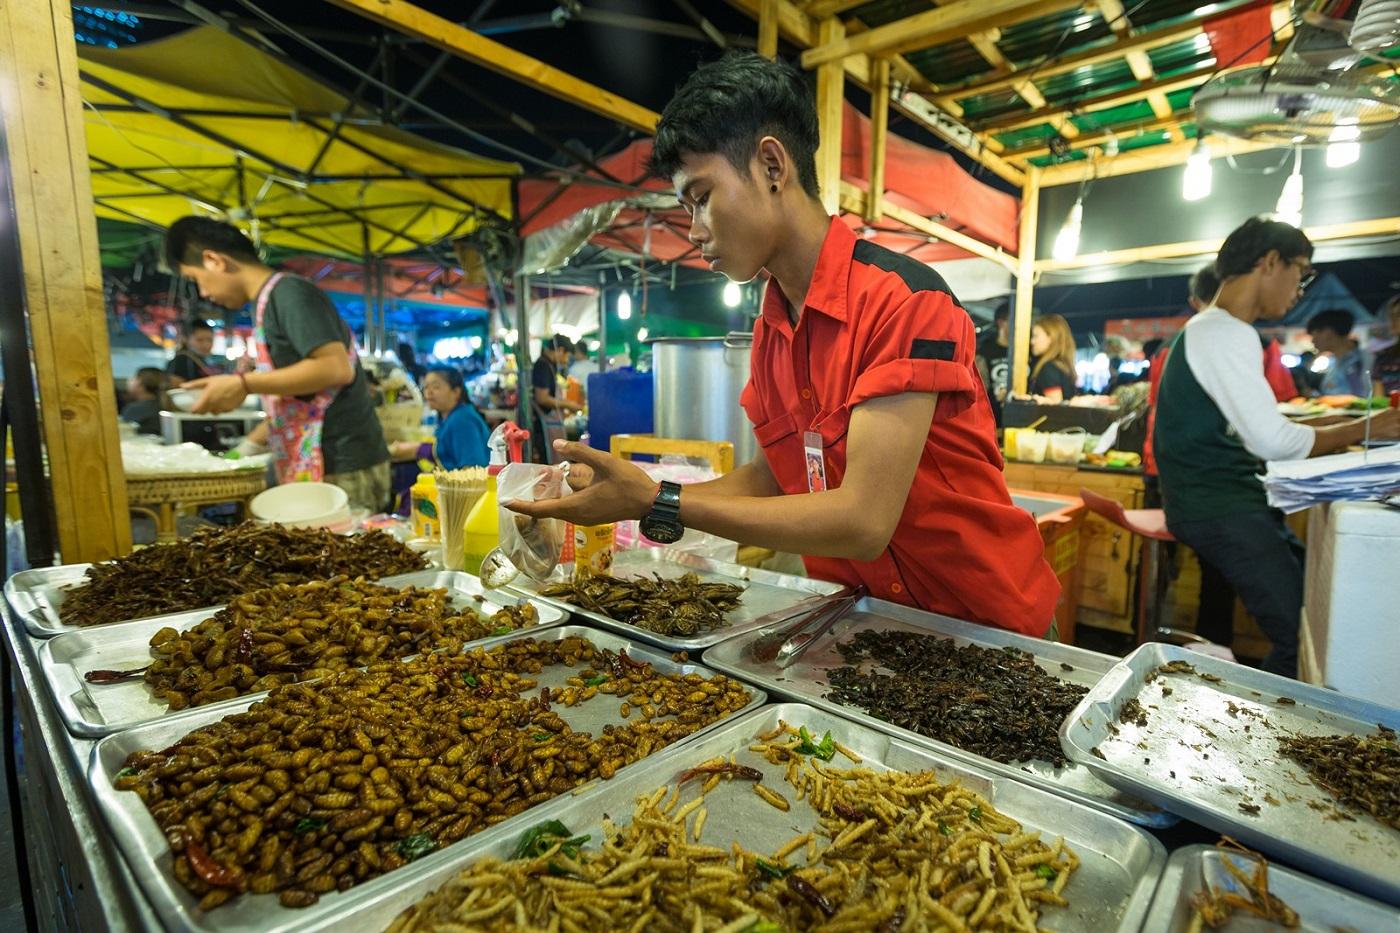 bangkok markets ratchada train night market rot faiDeep fried insects